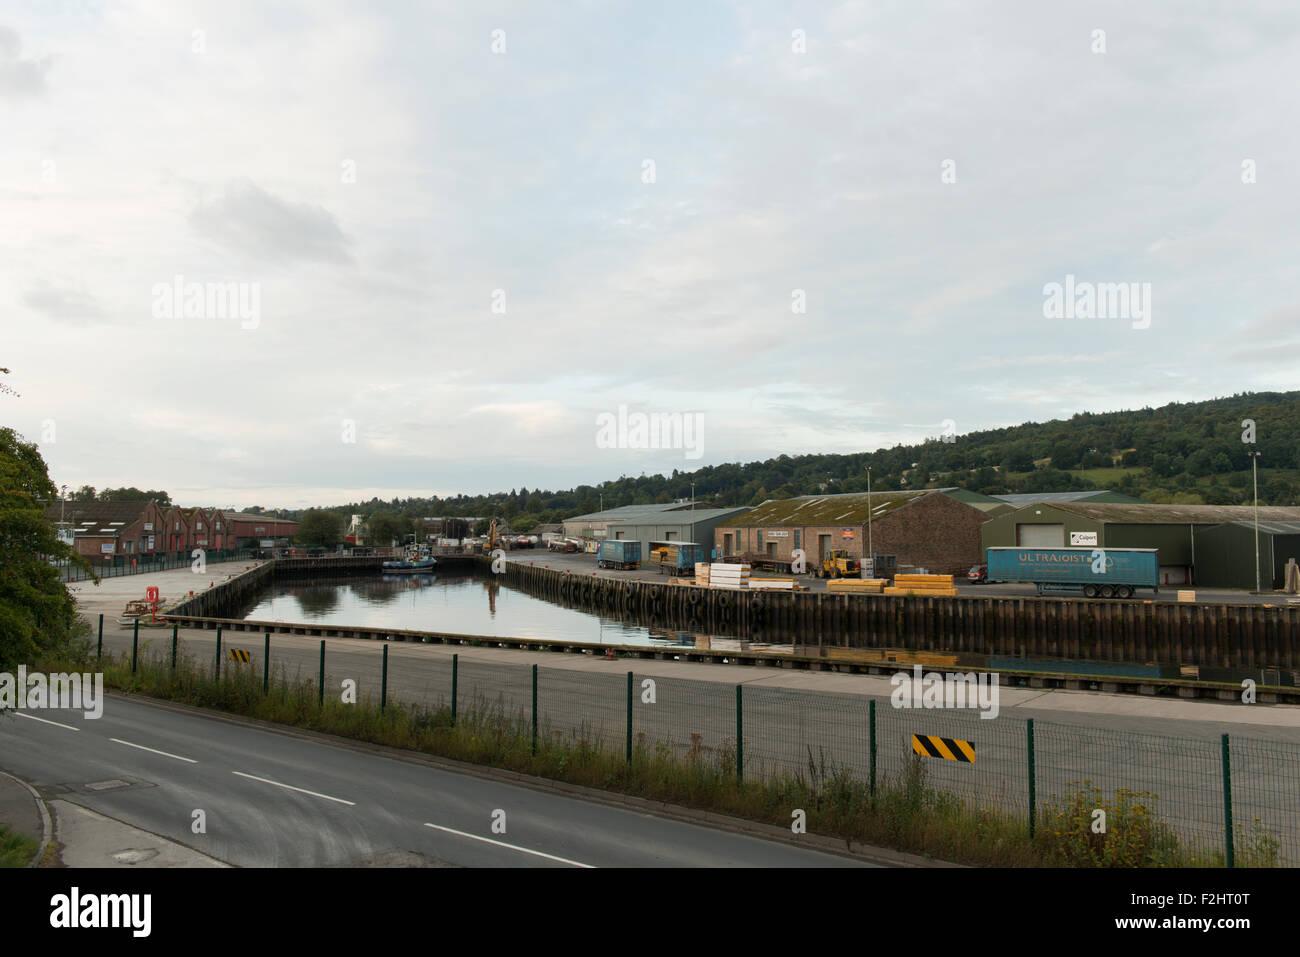 Perth harbour,lower Friarton,Perth,Scotland,UK, - Stock Image